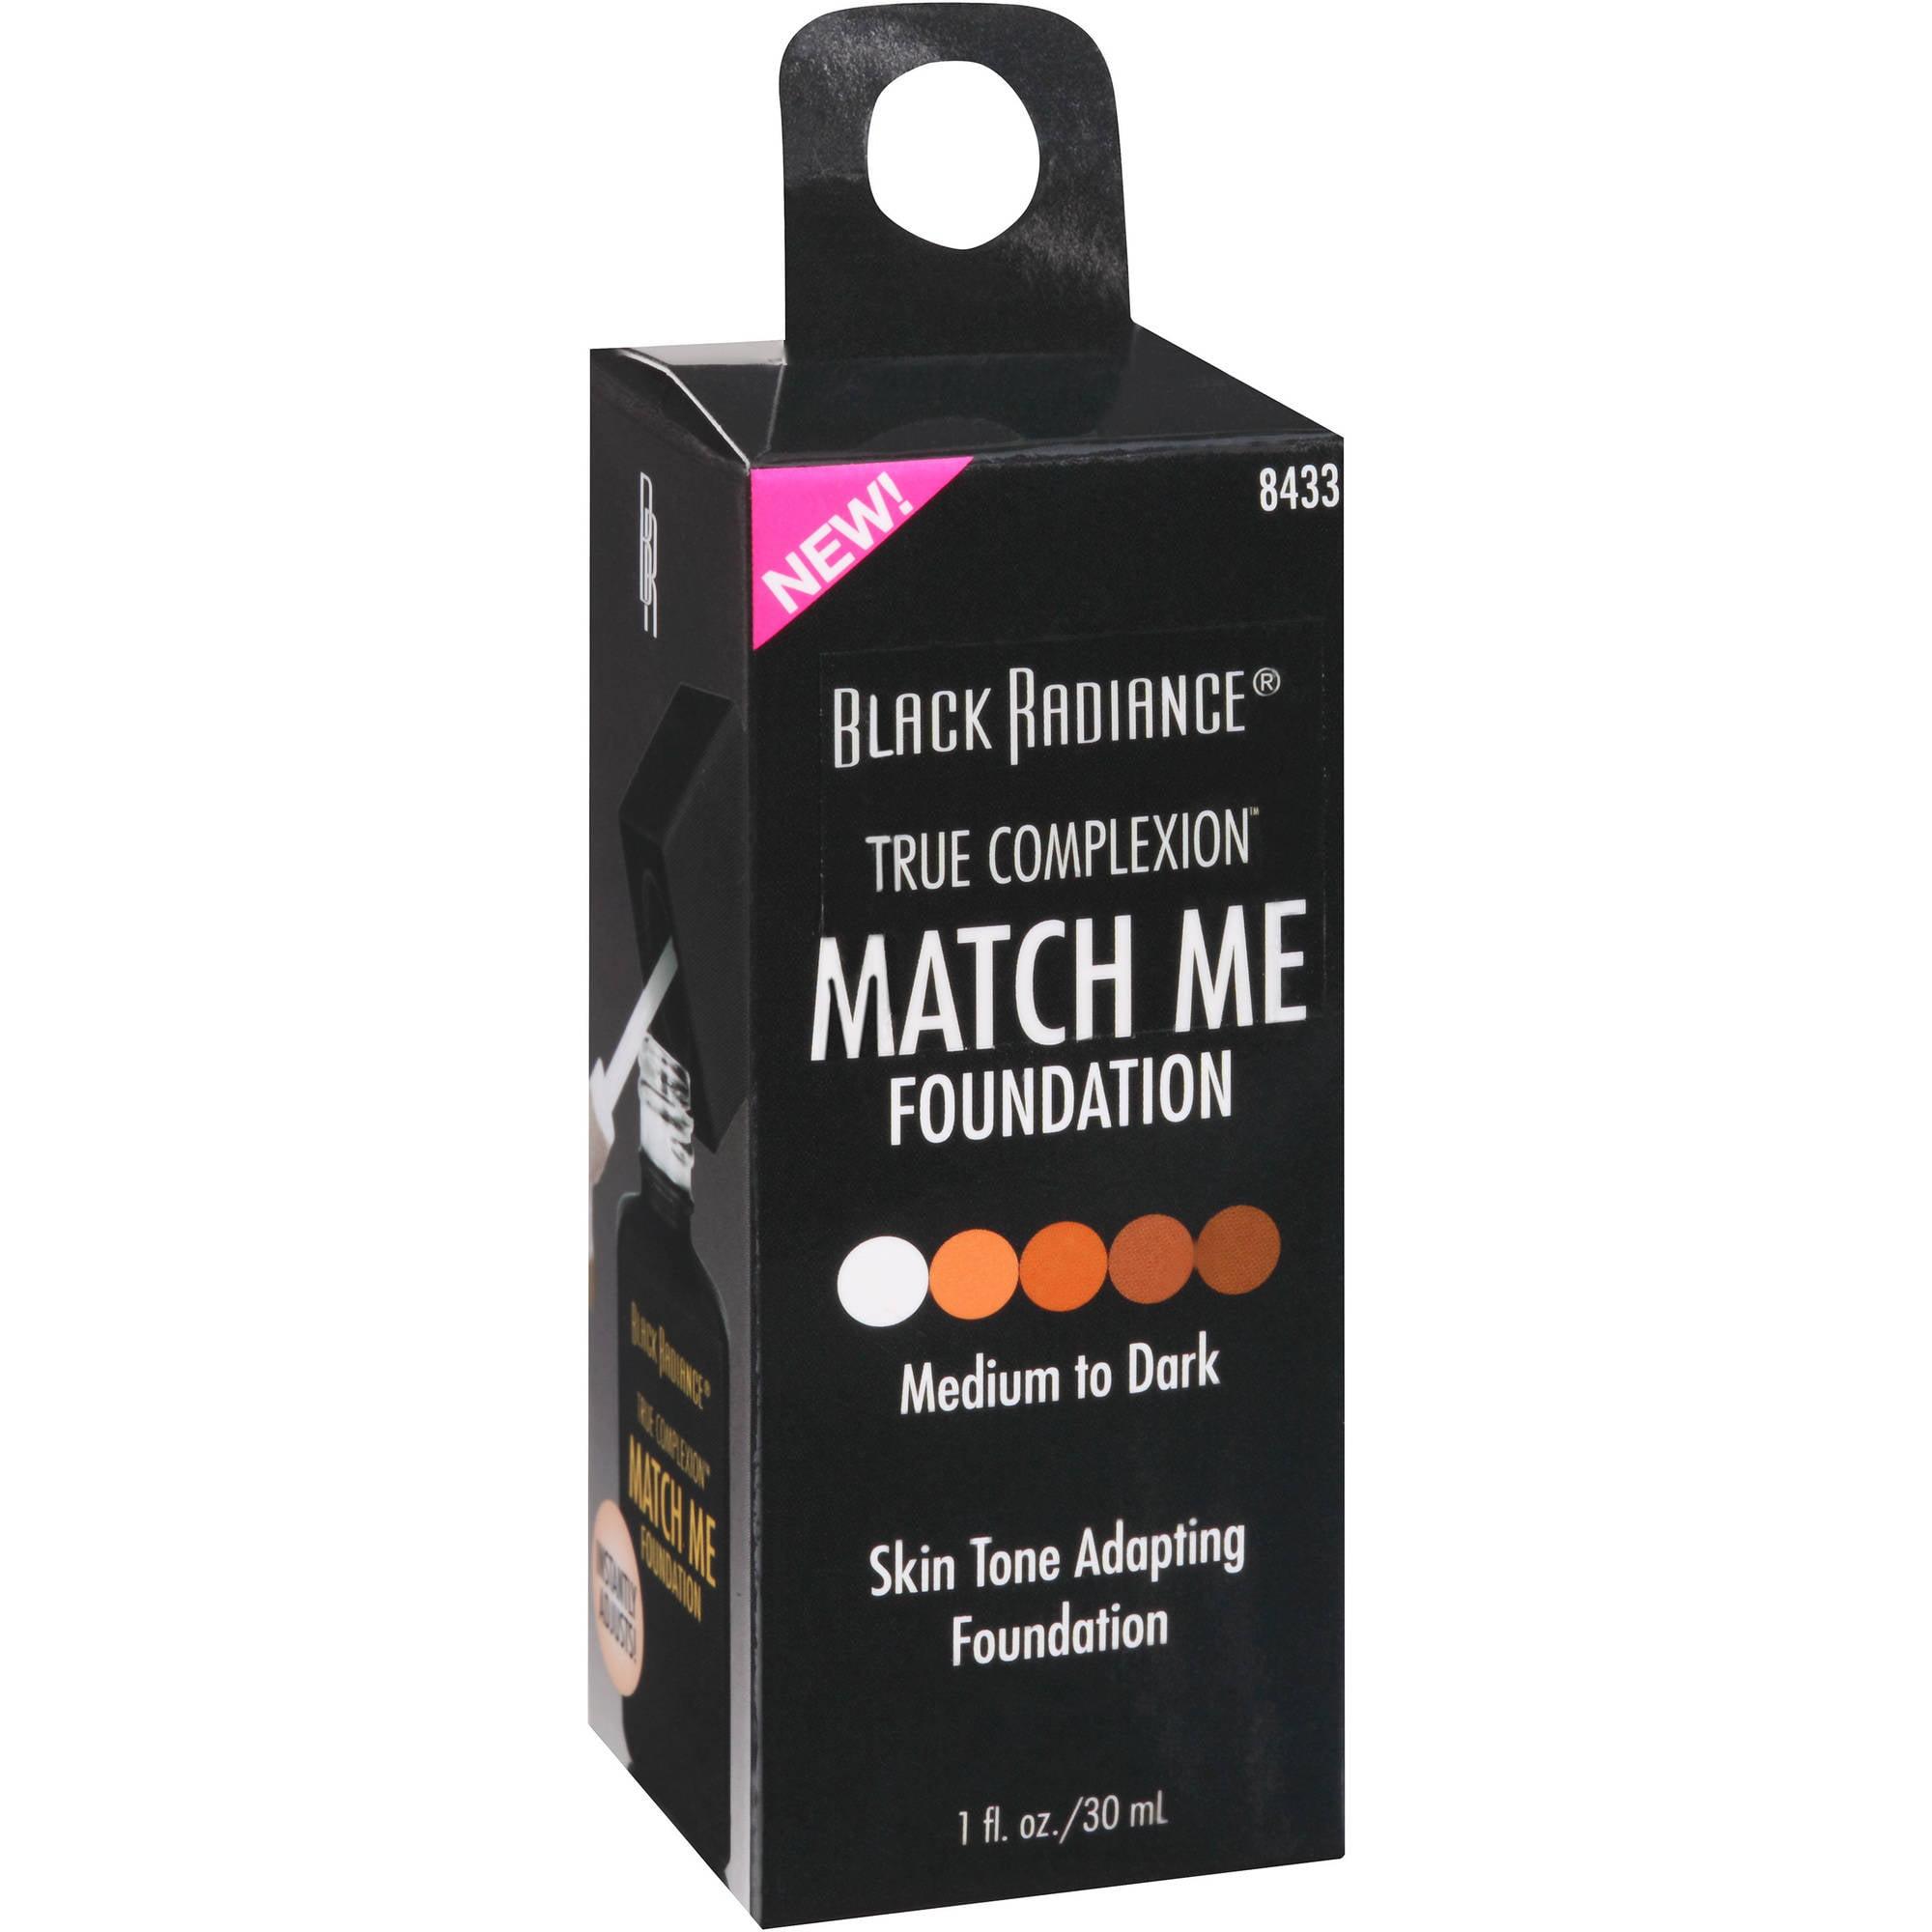 Black Radiance True Complexion Match Me Foundation, 8433 Medium to Dark, 1 fl oz